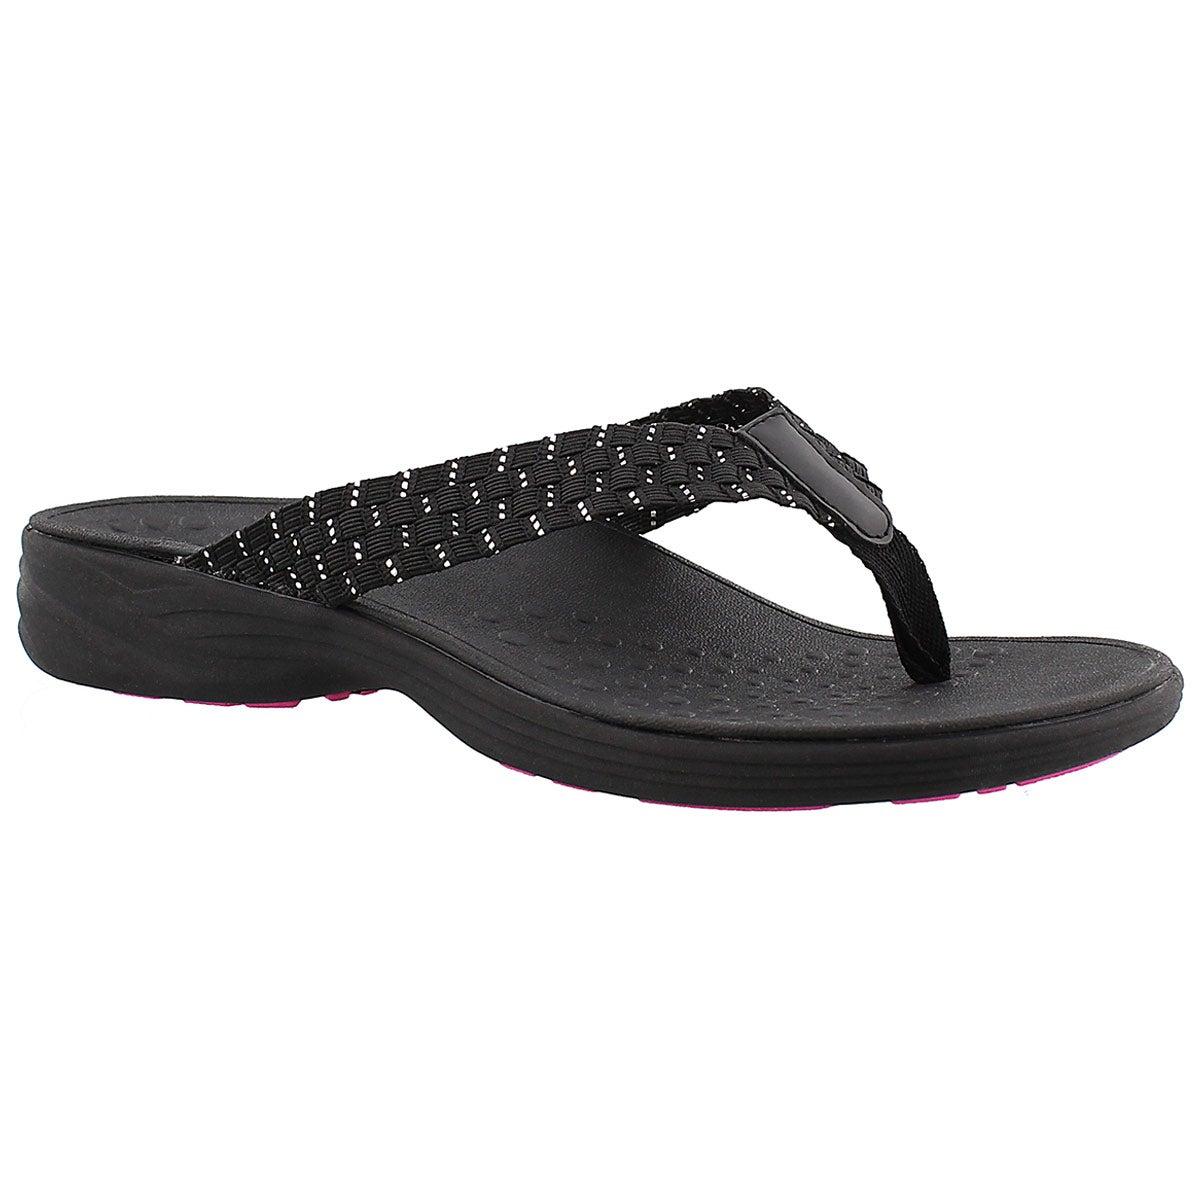 Women's HAZEL black arch support thong sandals